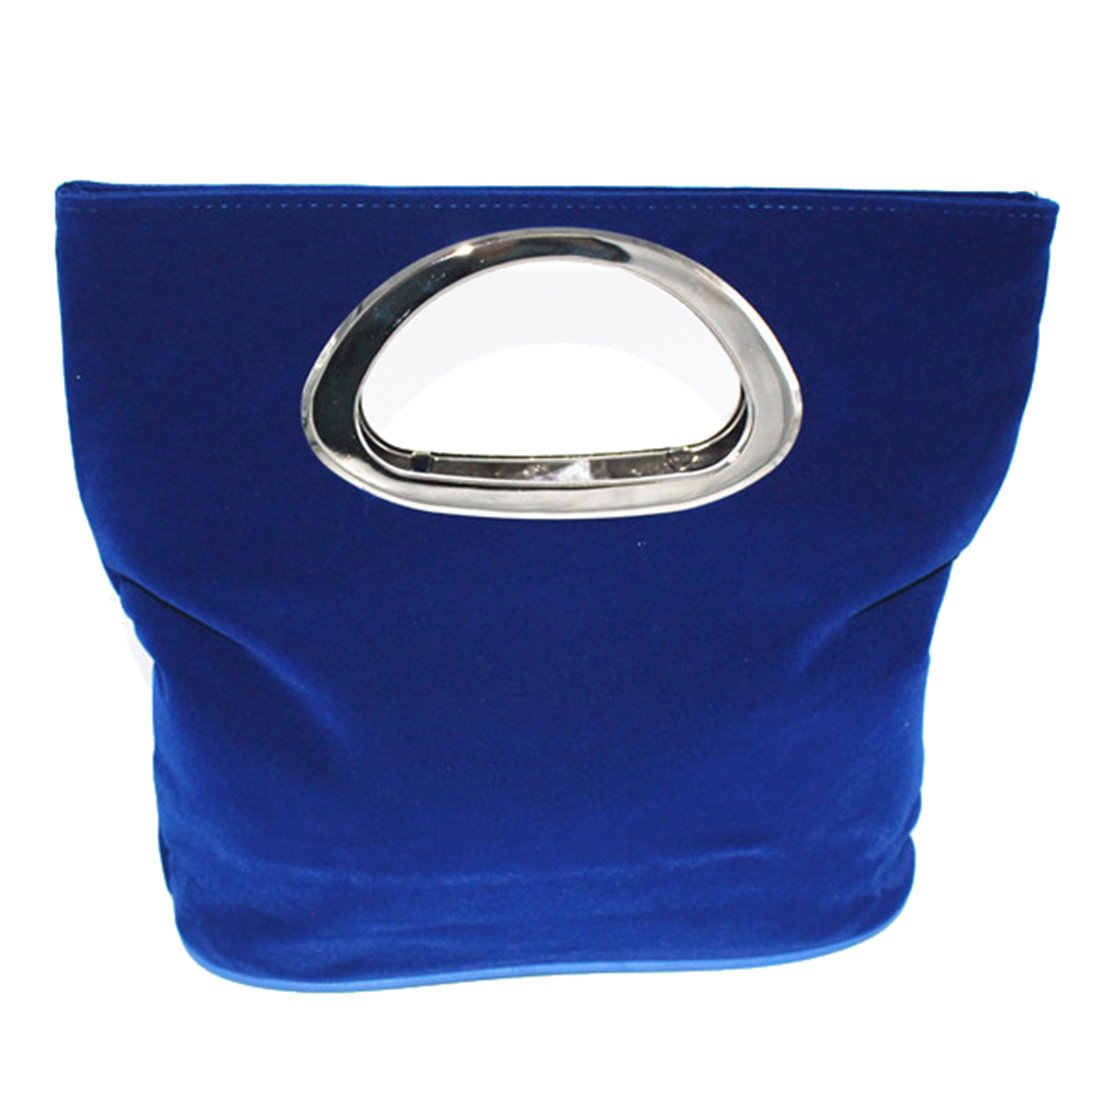 Women Cocktail Prom Party Handle Bag Suede Clutch Evening Purse Wedding Handbag (Blue)